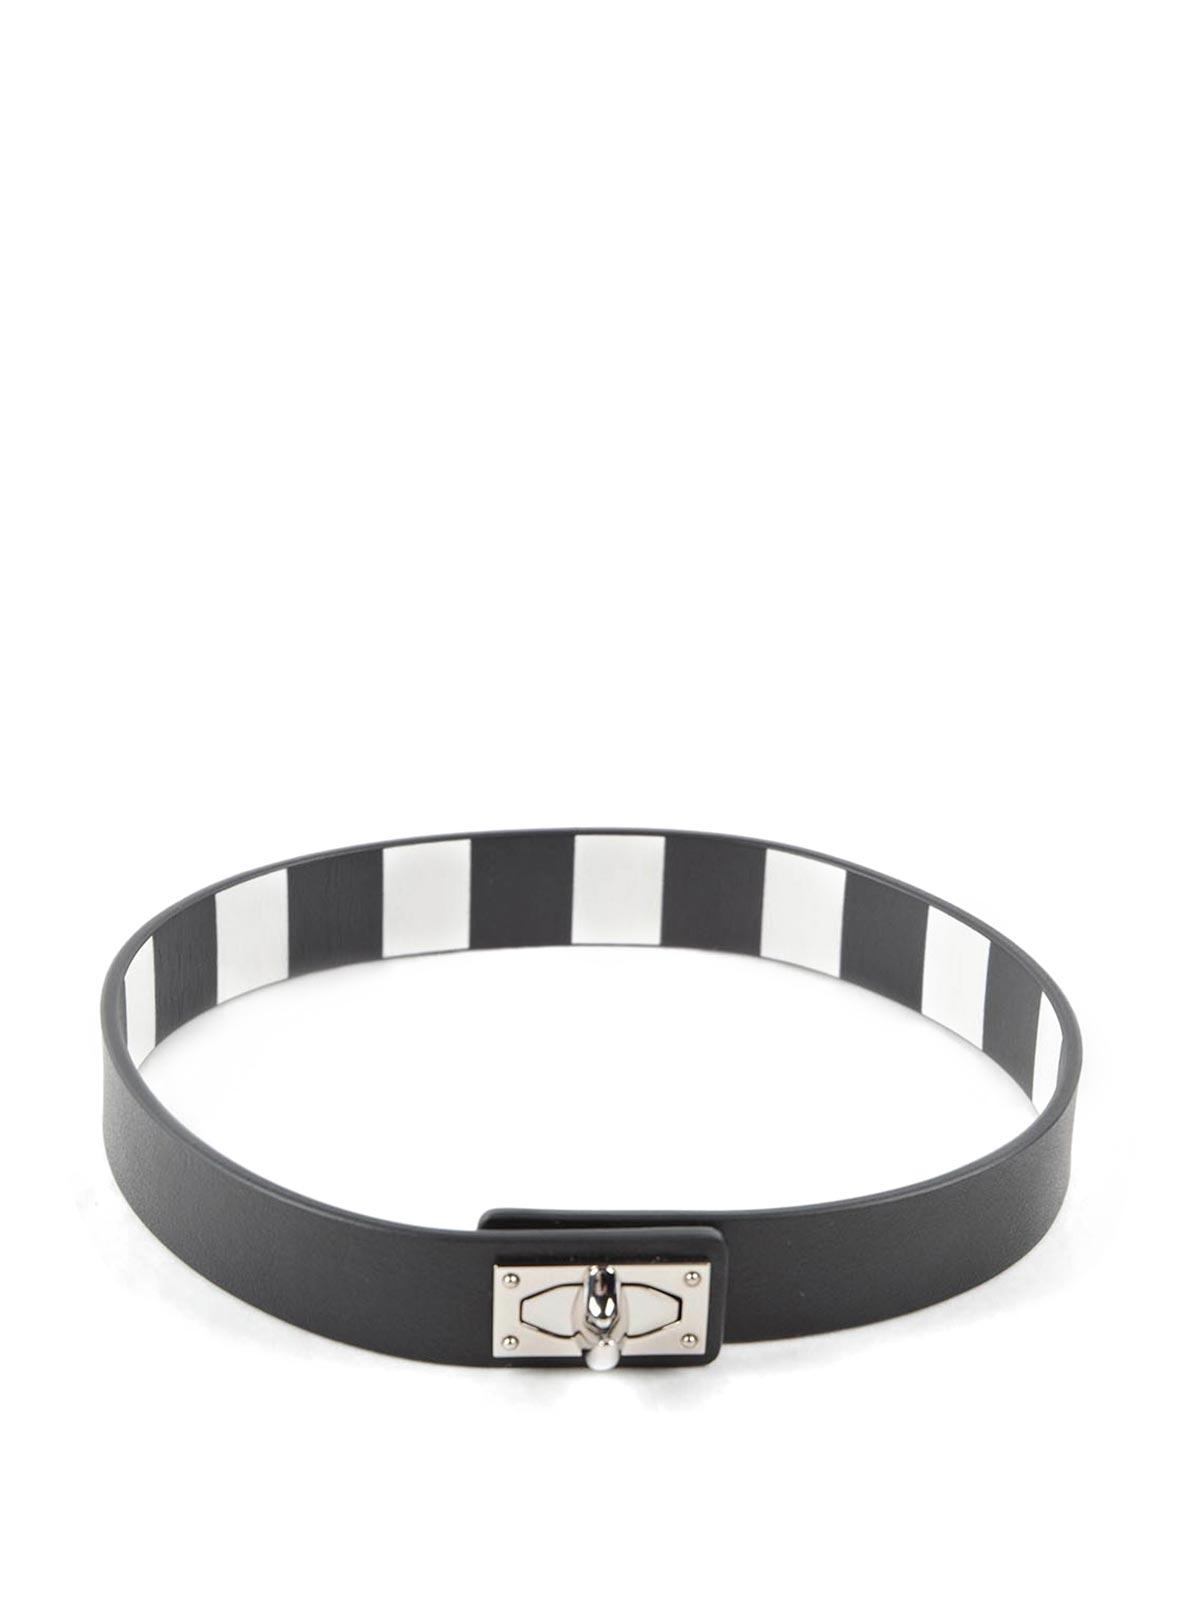 66f9583b303 Givenchy - Bracelets 2 Row Shark Pour Homme - Bracelets - 3007980 004